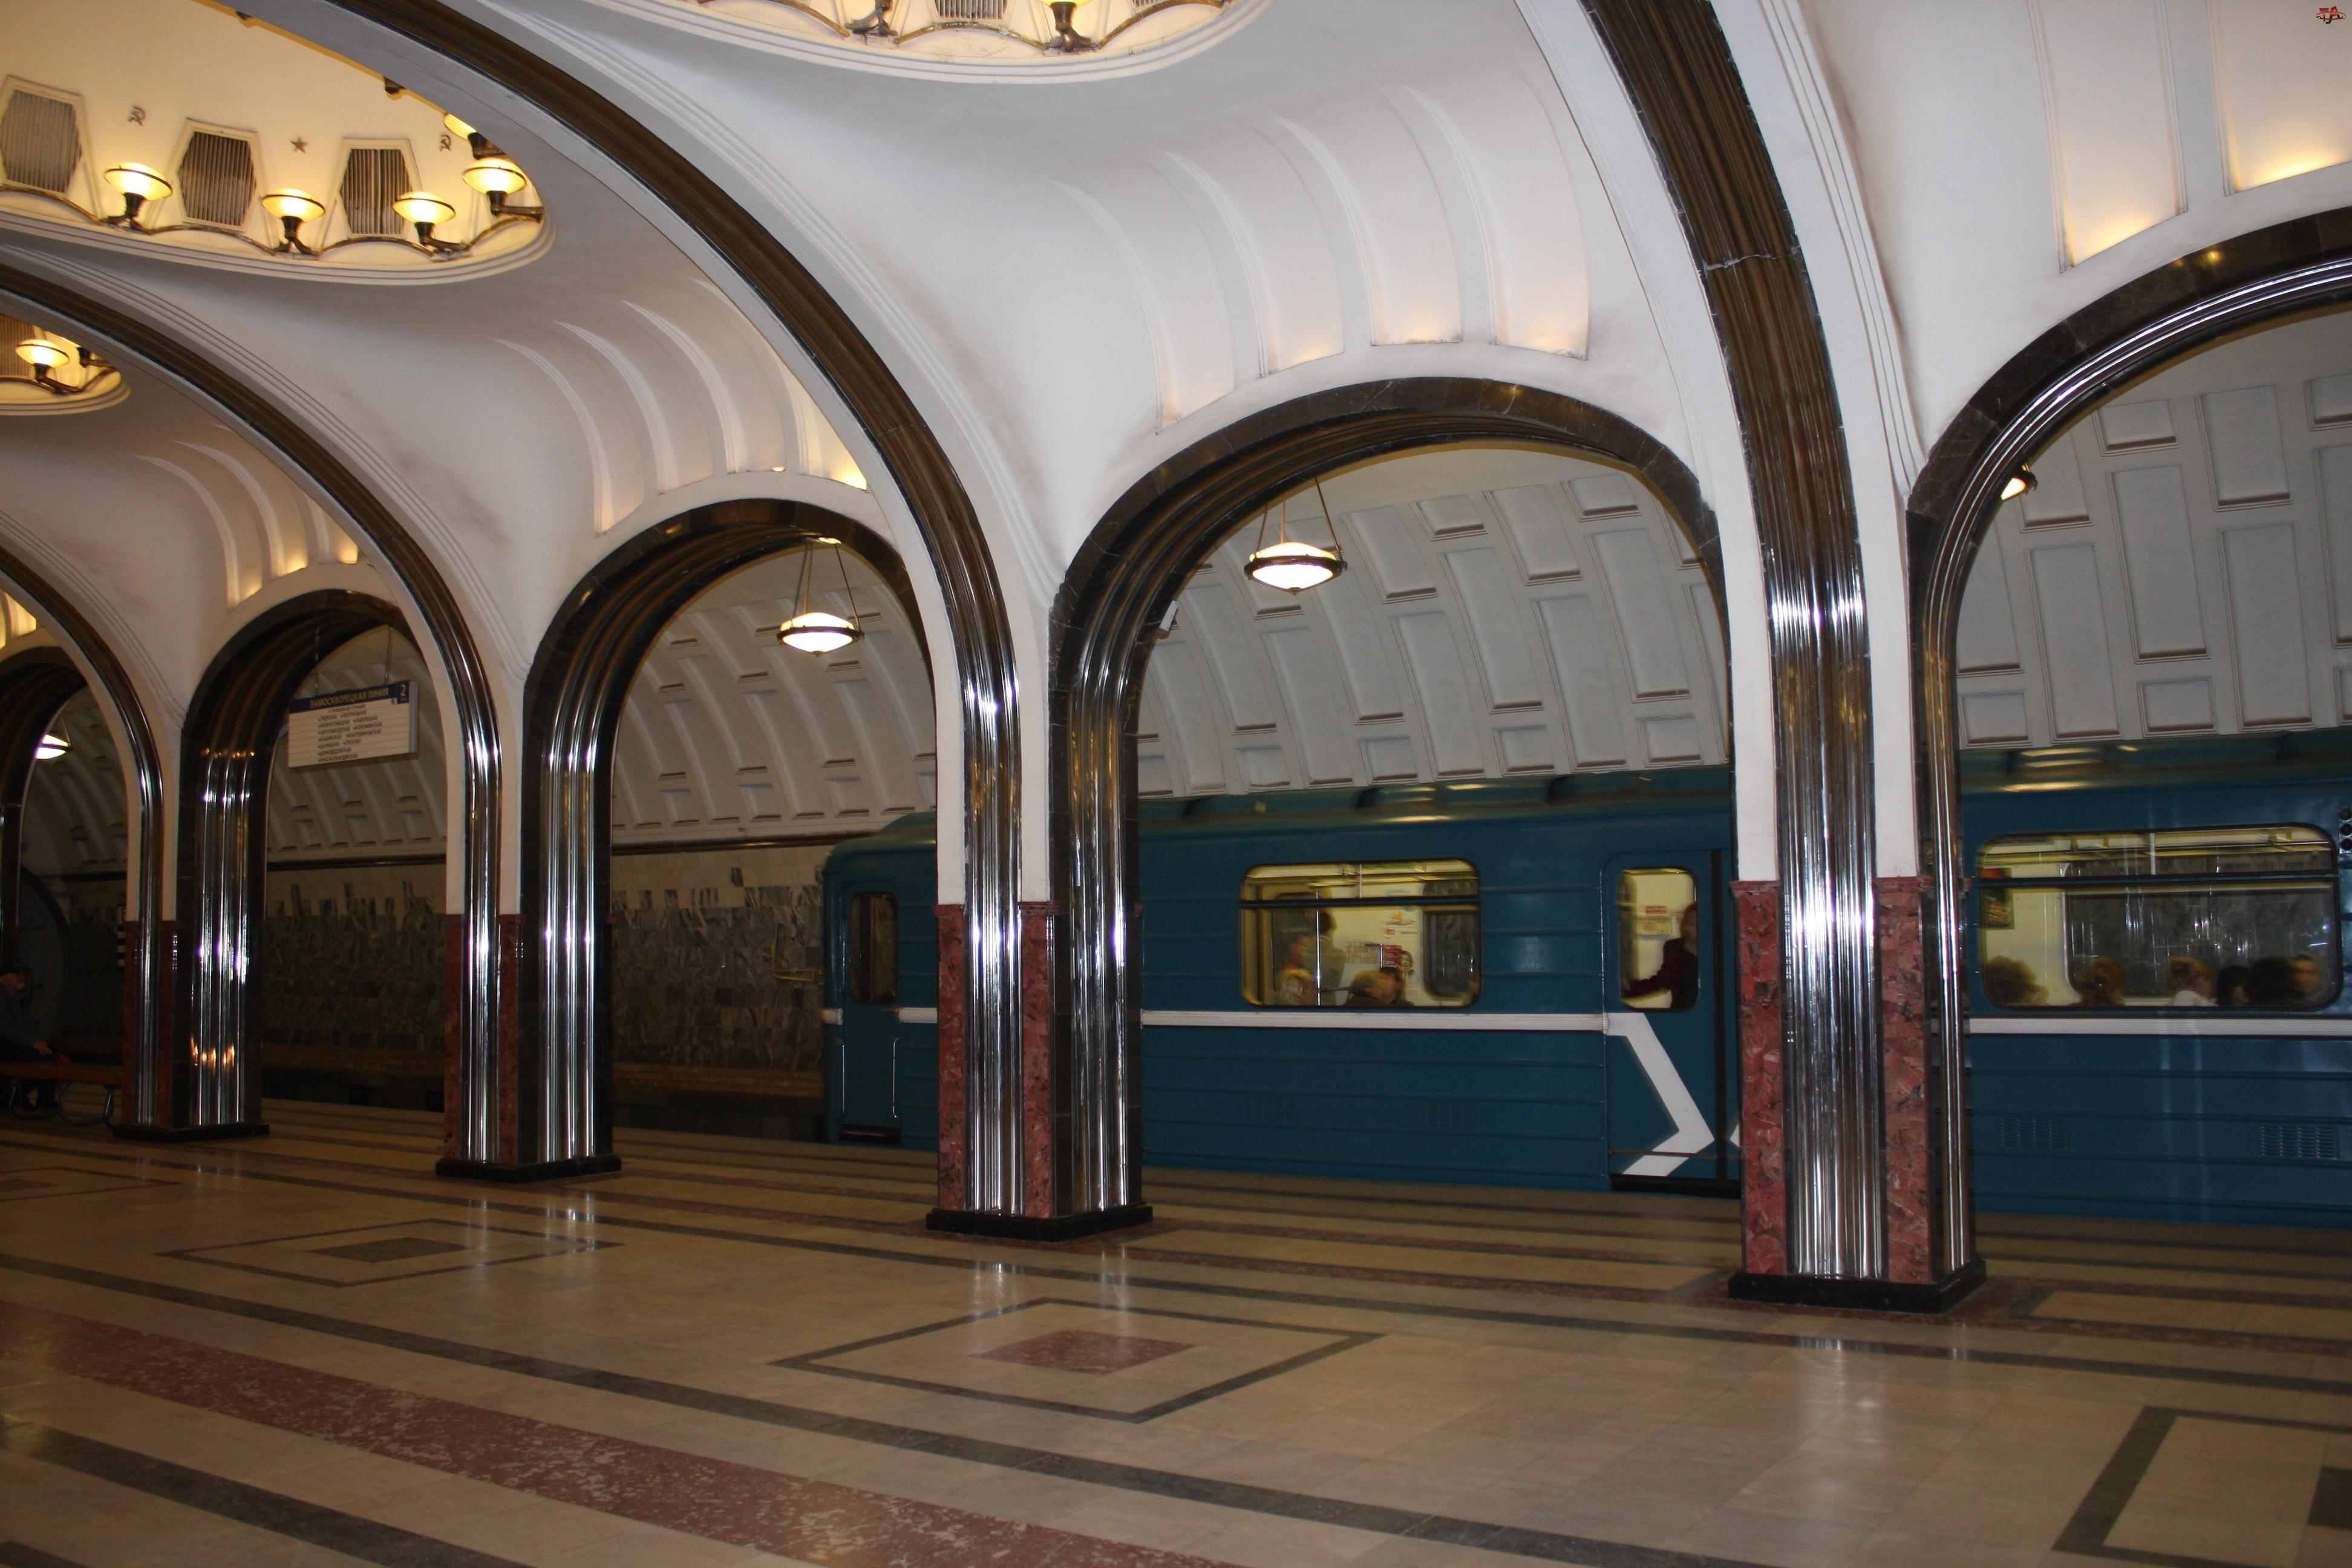 Rosja, Metro, Moskwa, Stacja Majakowskaja